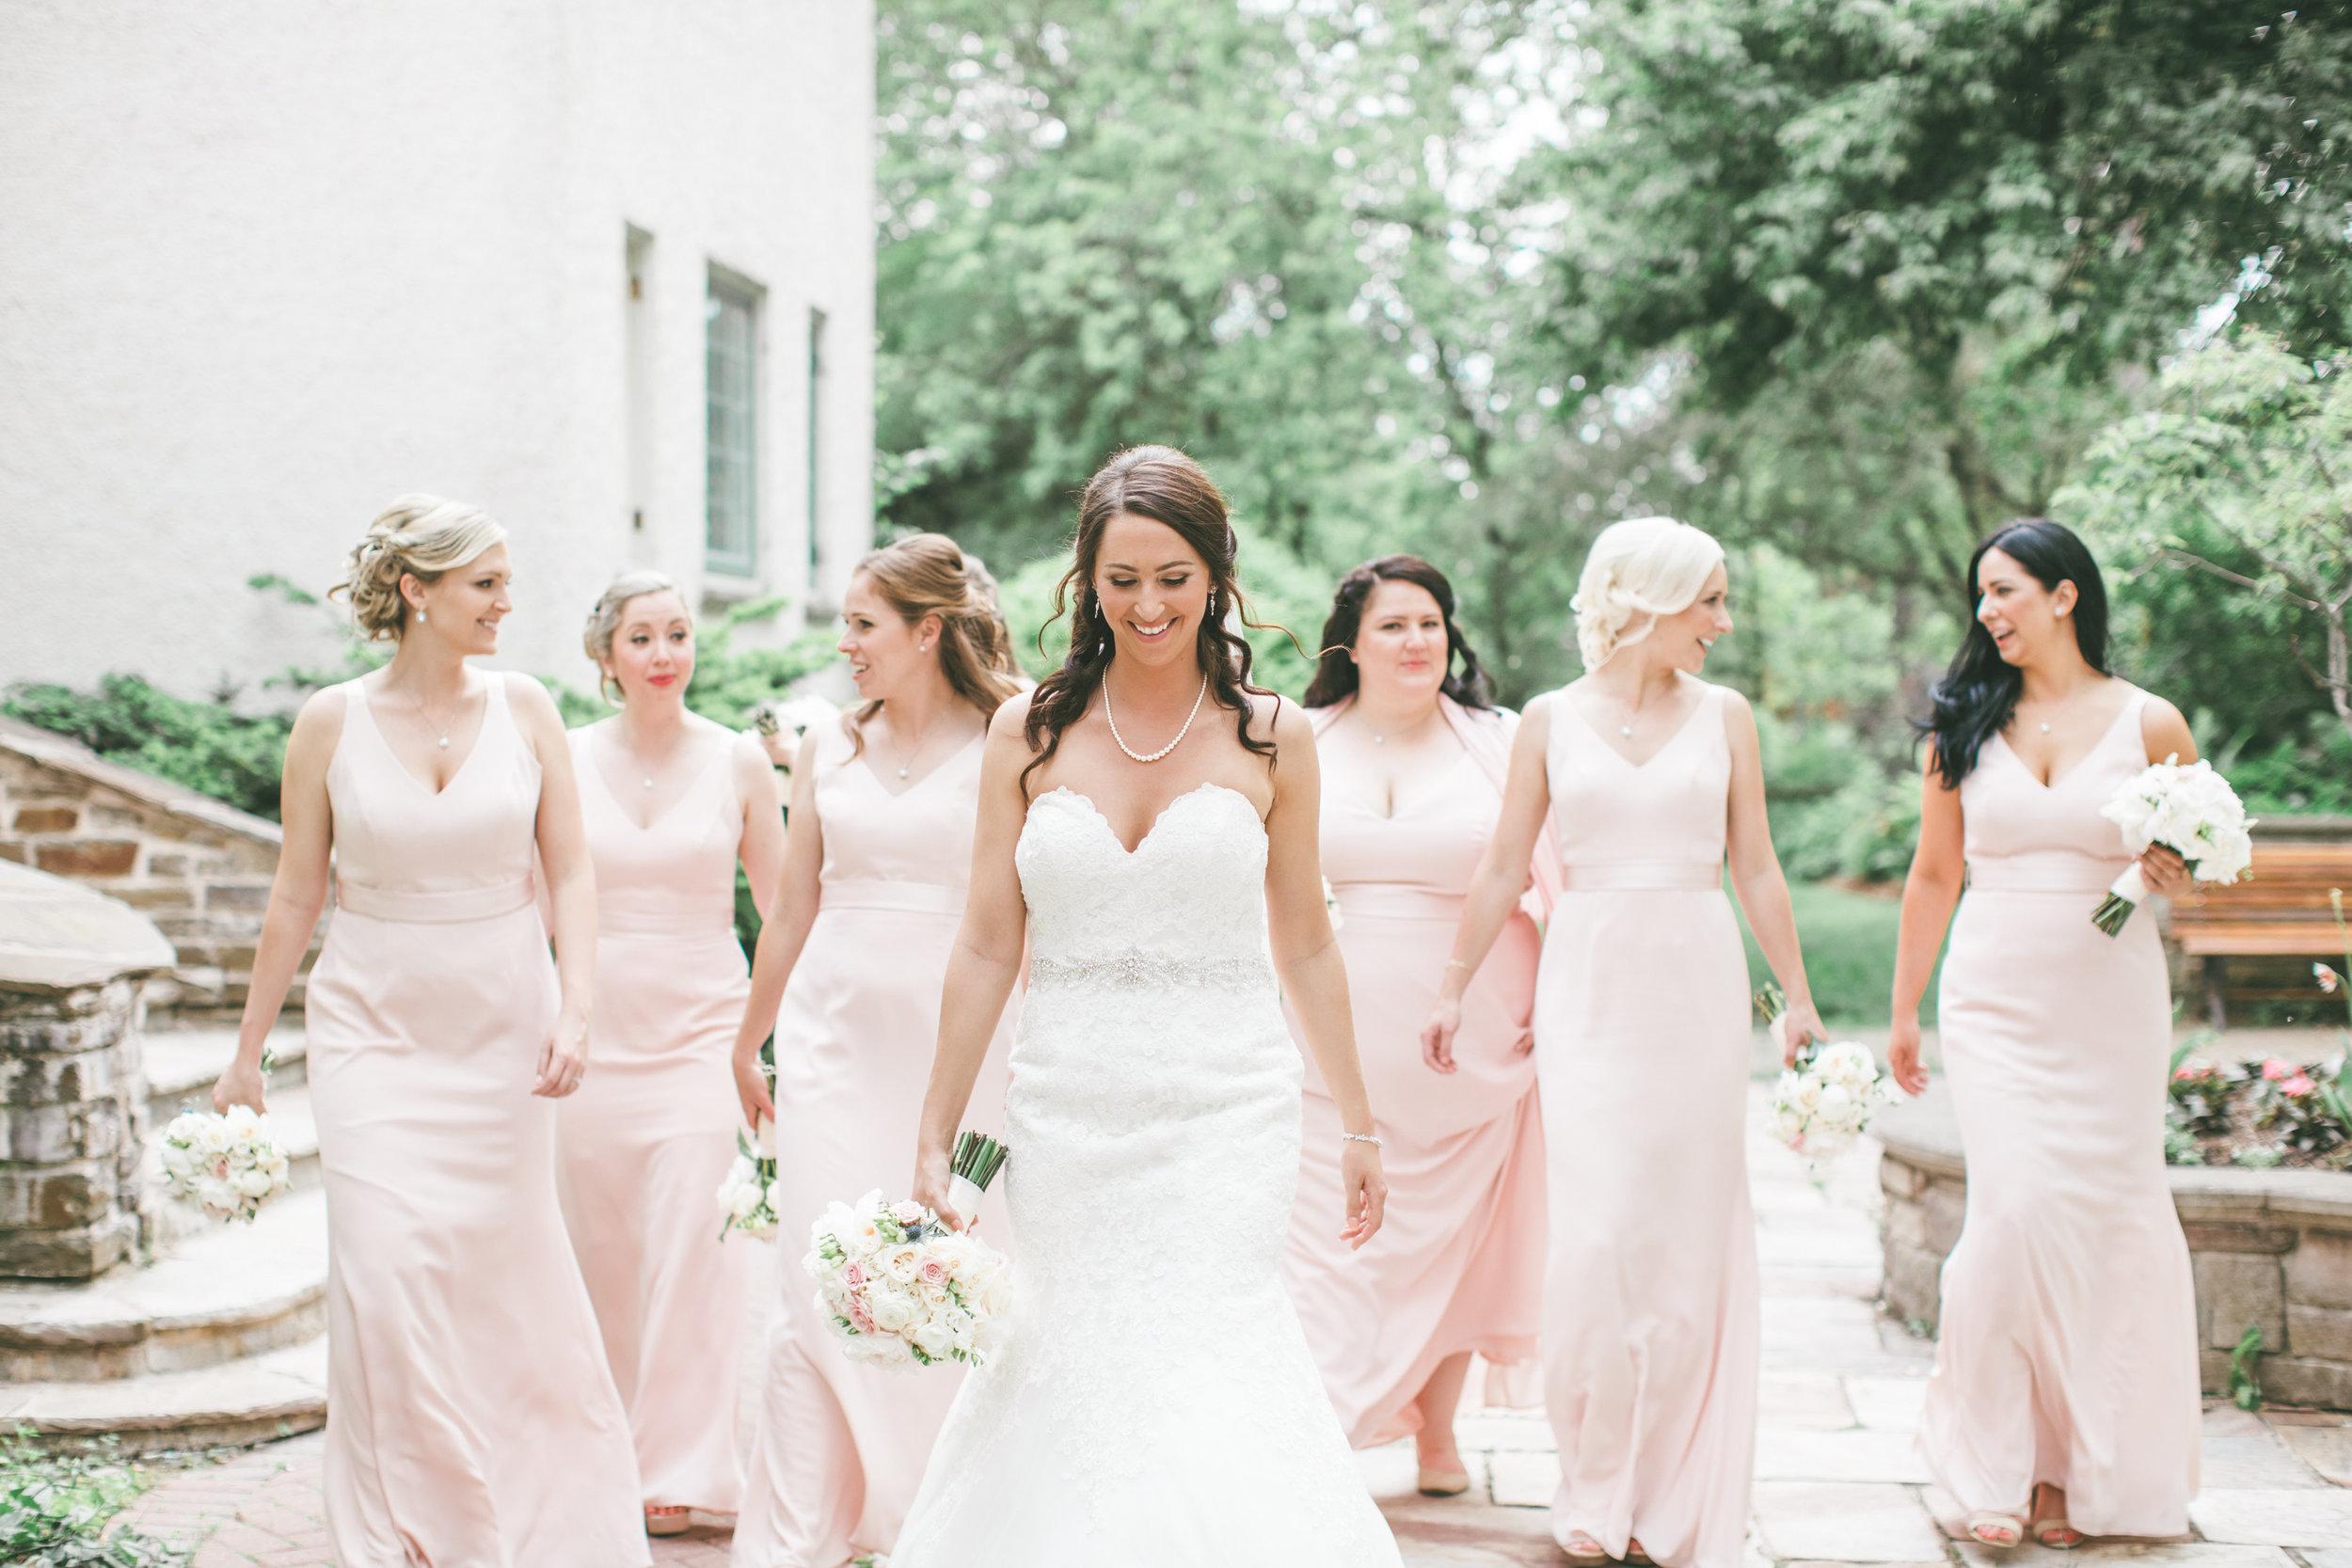 ashley___dario_wedding___lifesreel_danielcaruso___1248.jpg